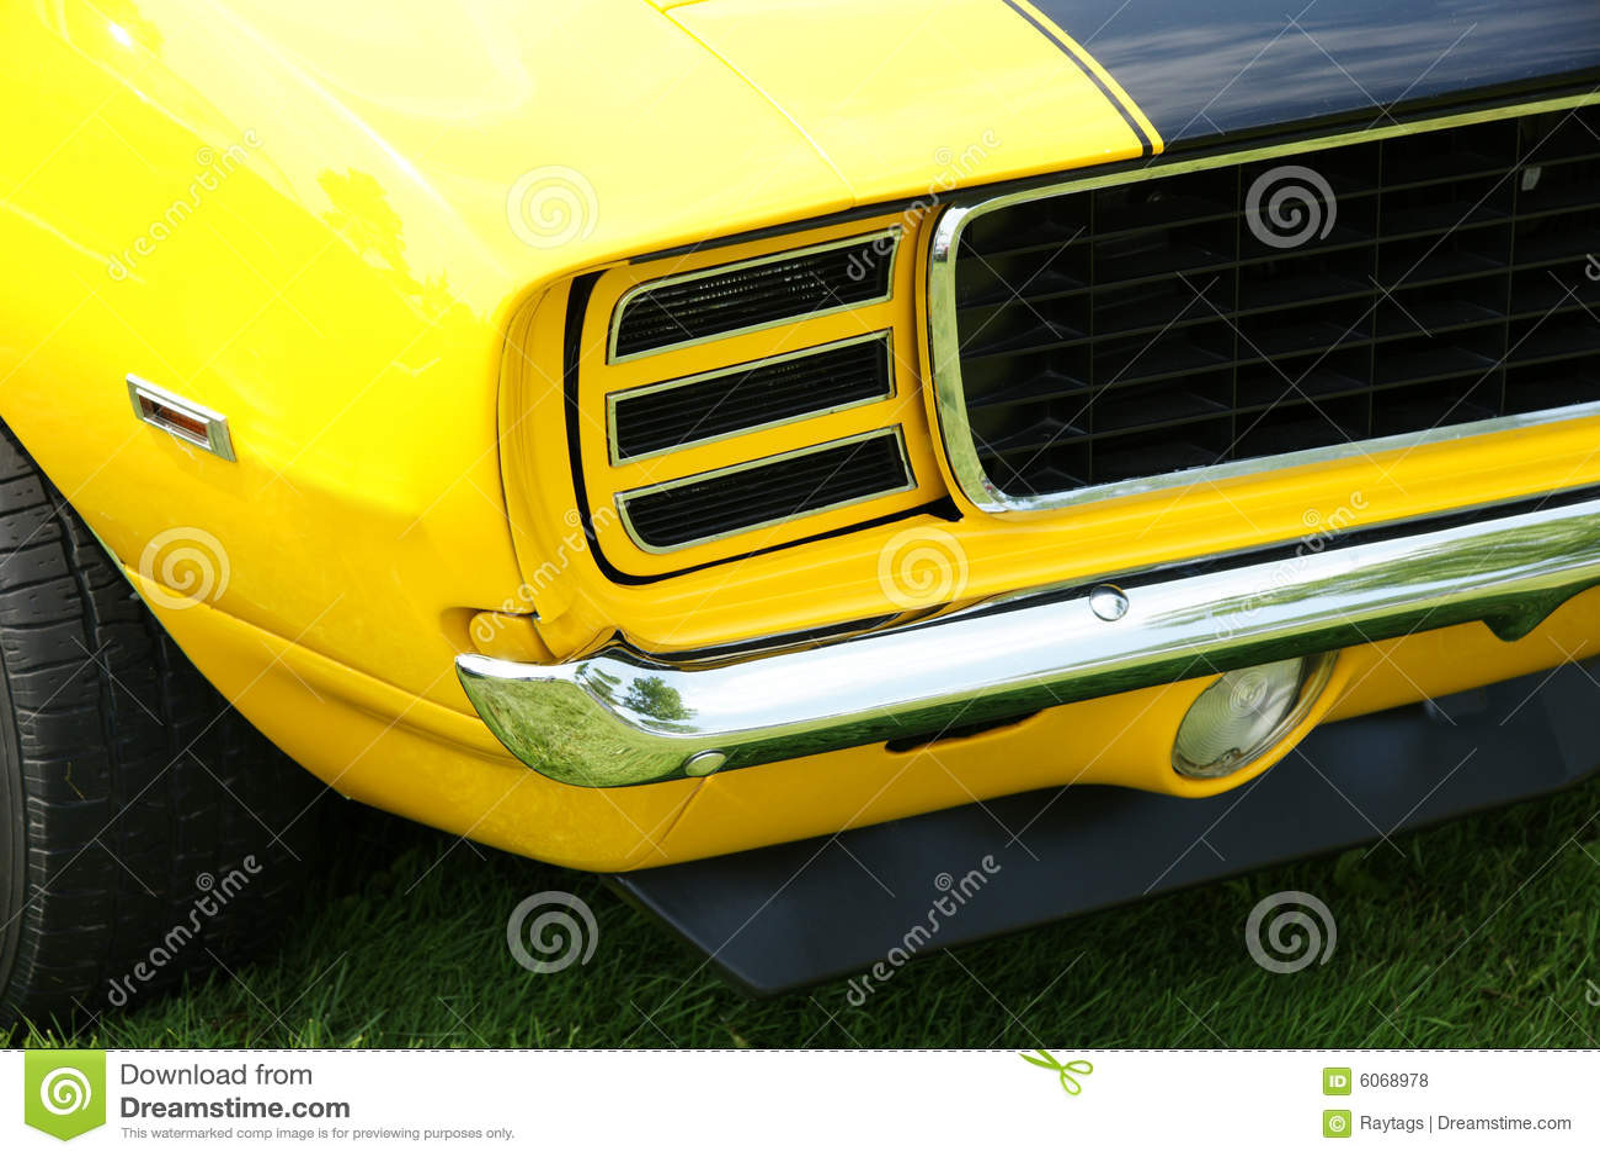 Camaro Front End